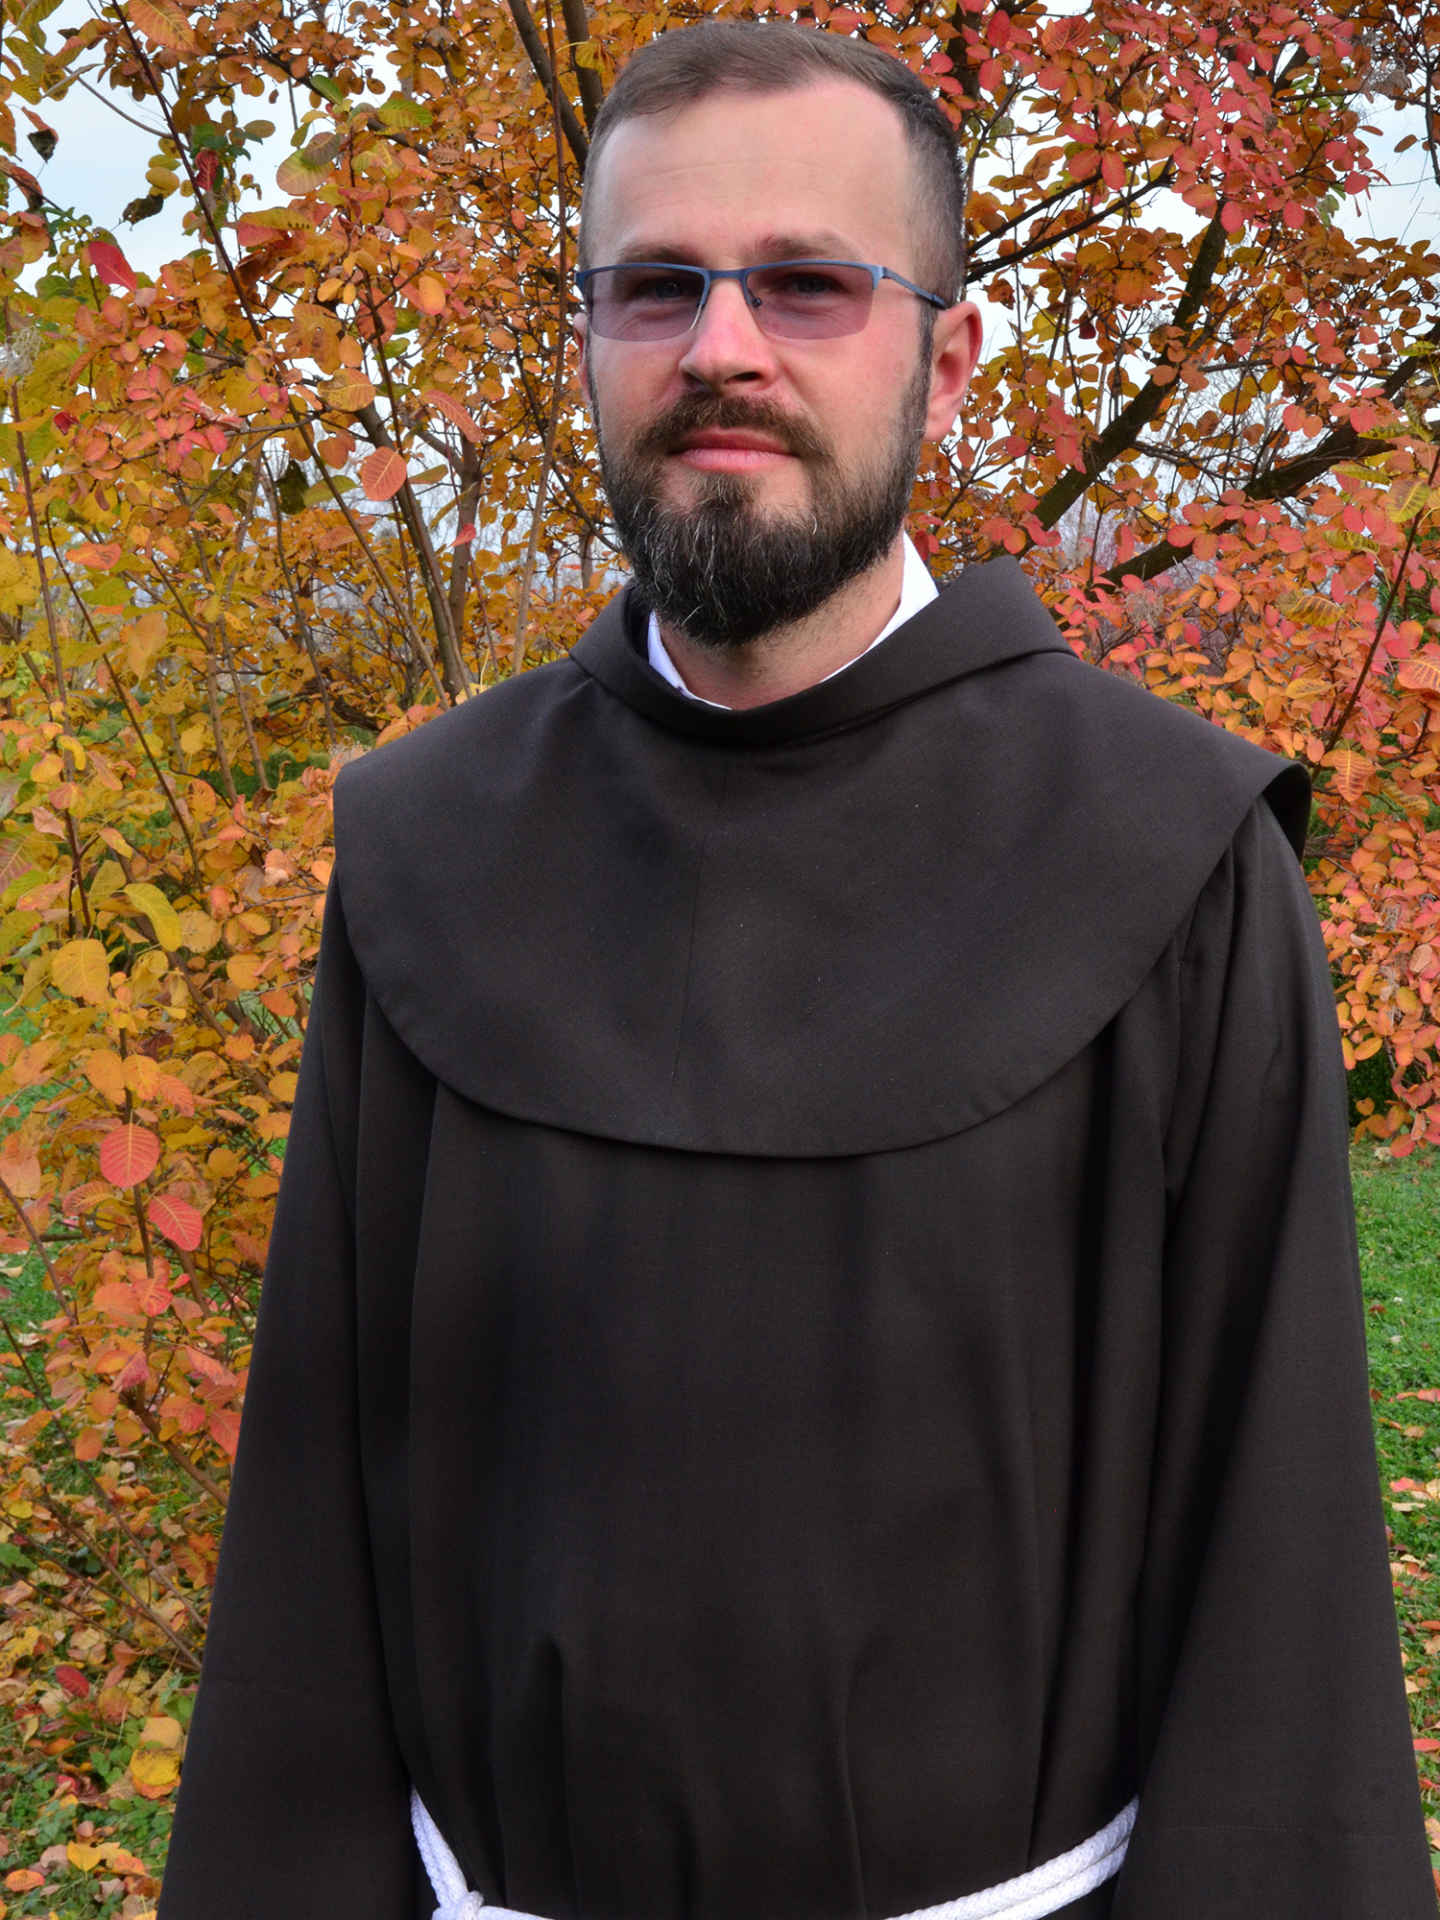 br. Oktawiusz Zygmunt